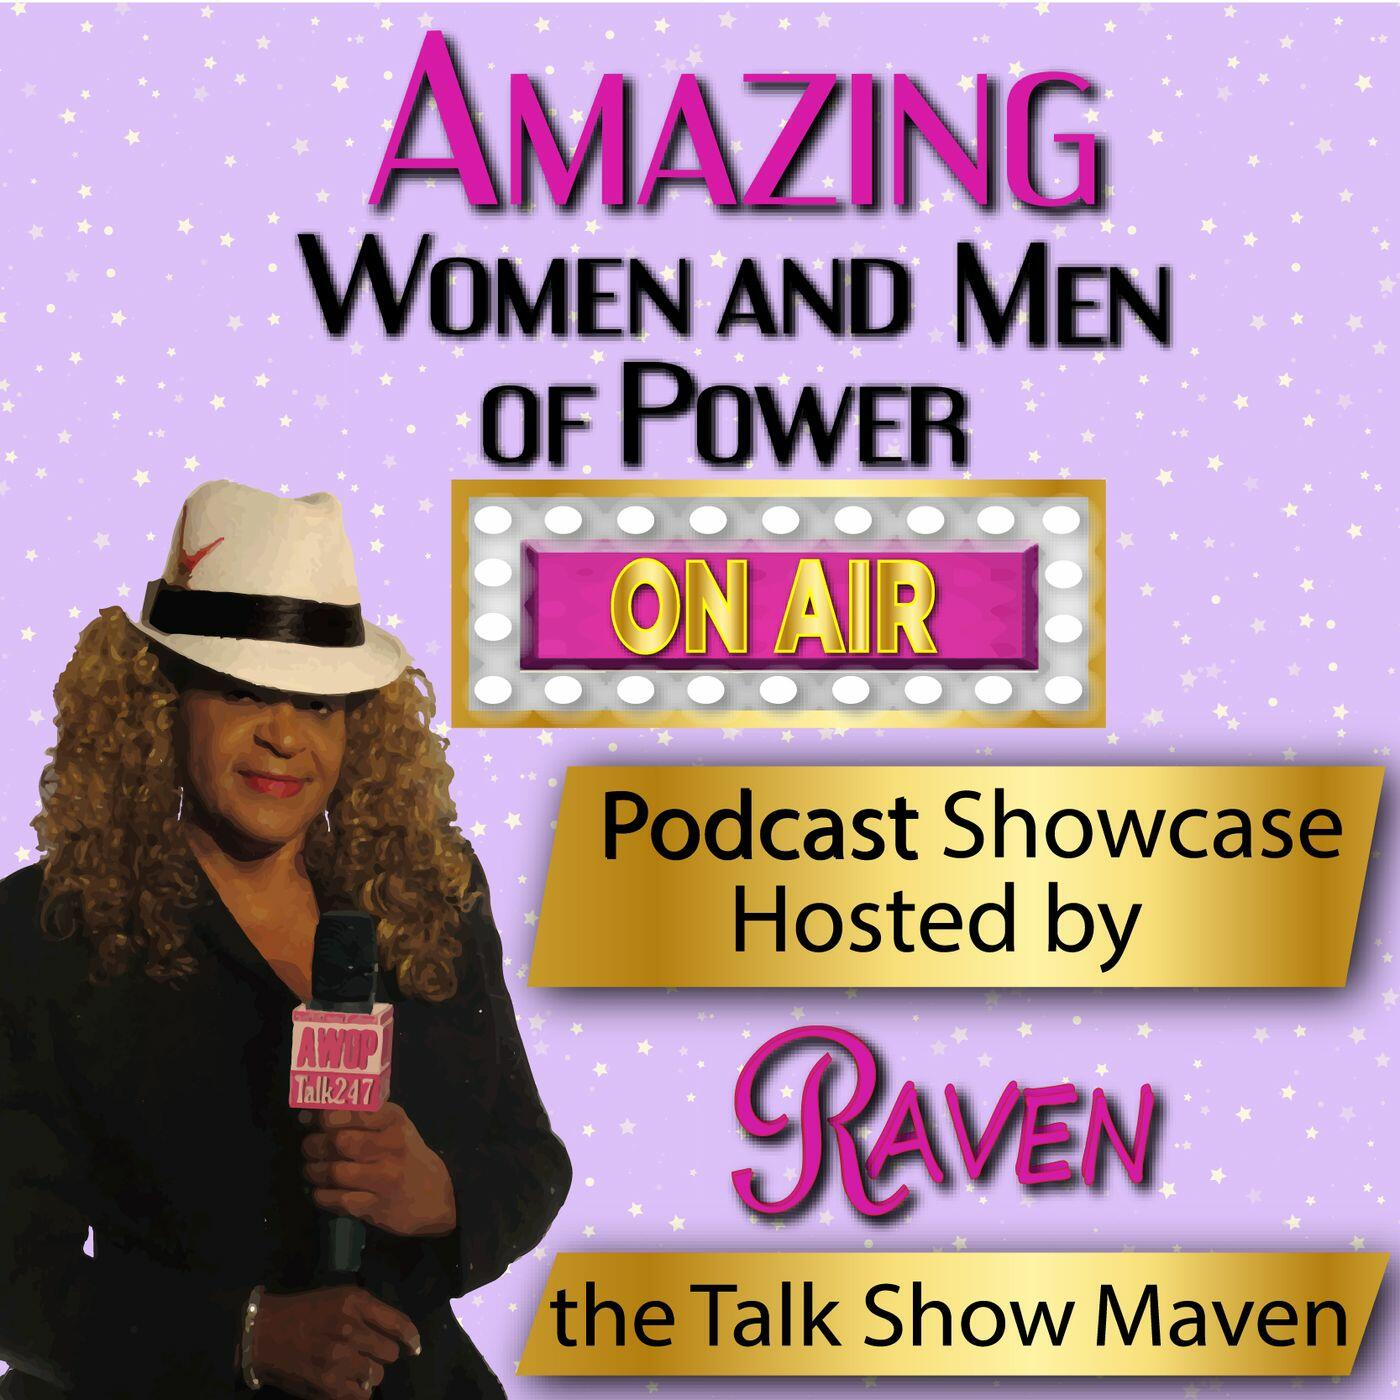 Amazing Women And Men Of Power